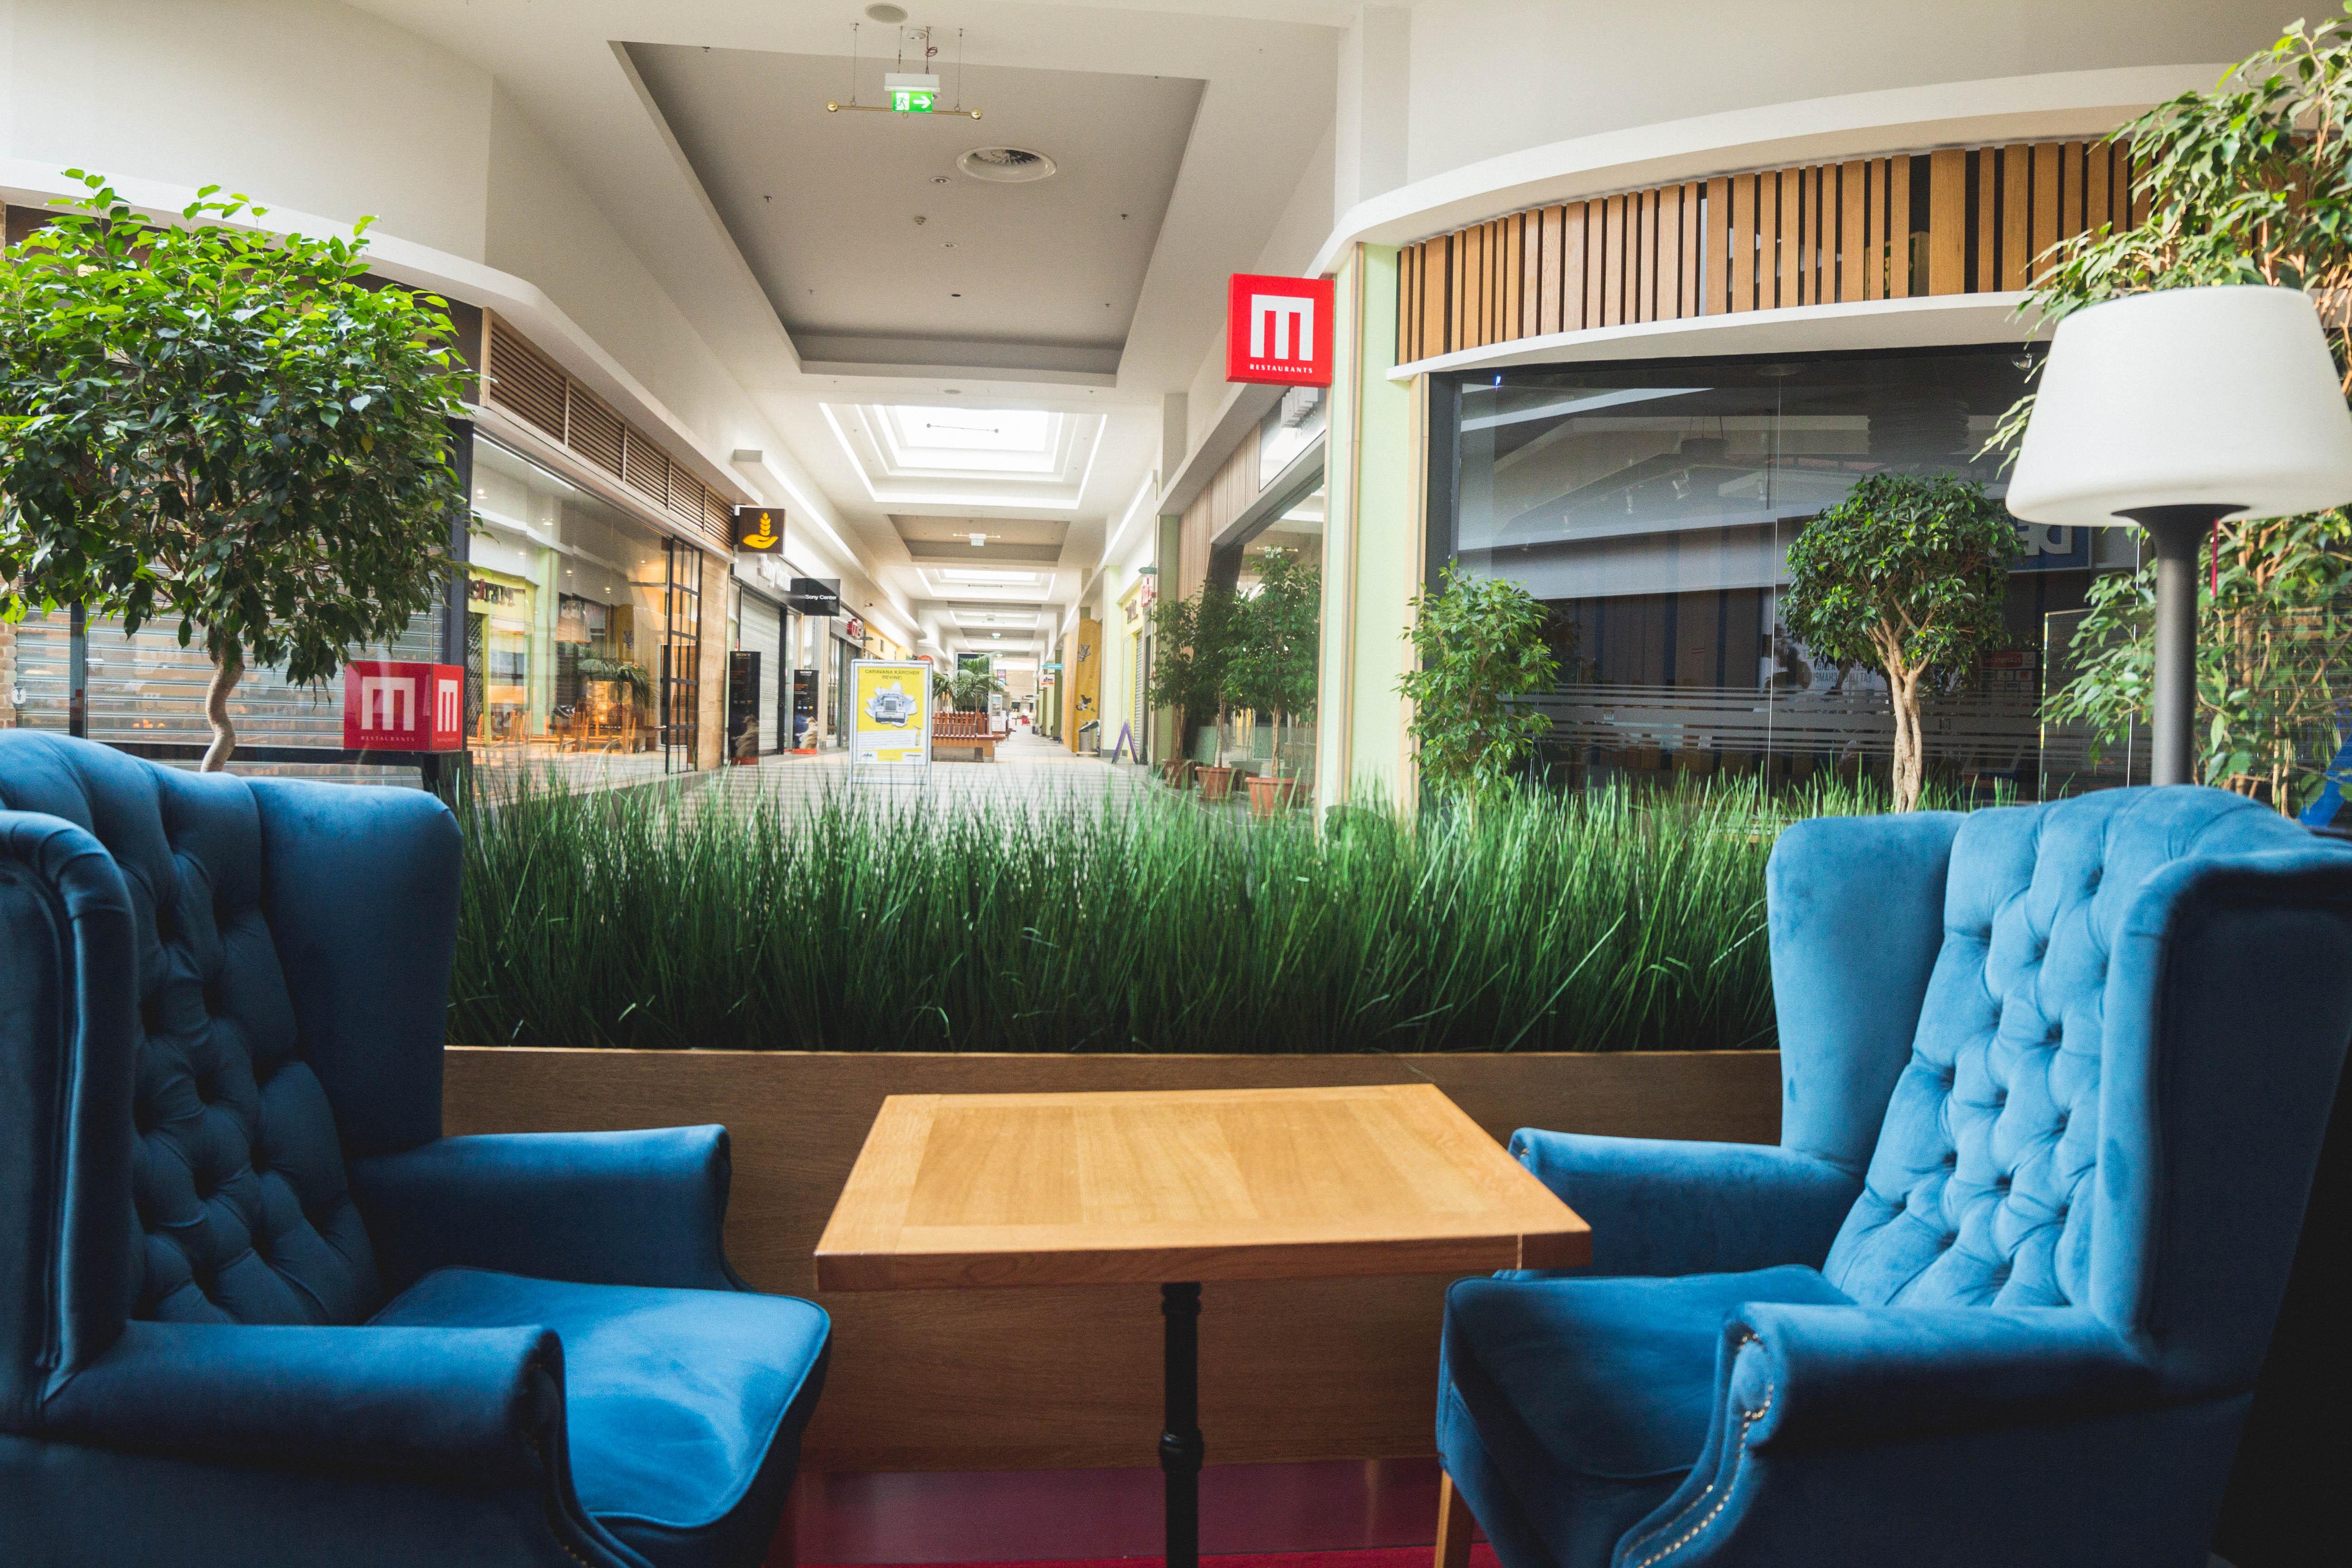 cafenea-marty-west-side-polus-center-cluj-napoca-10